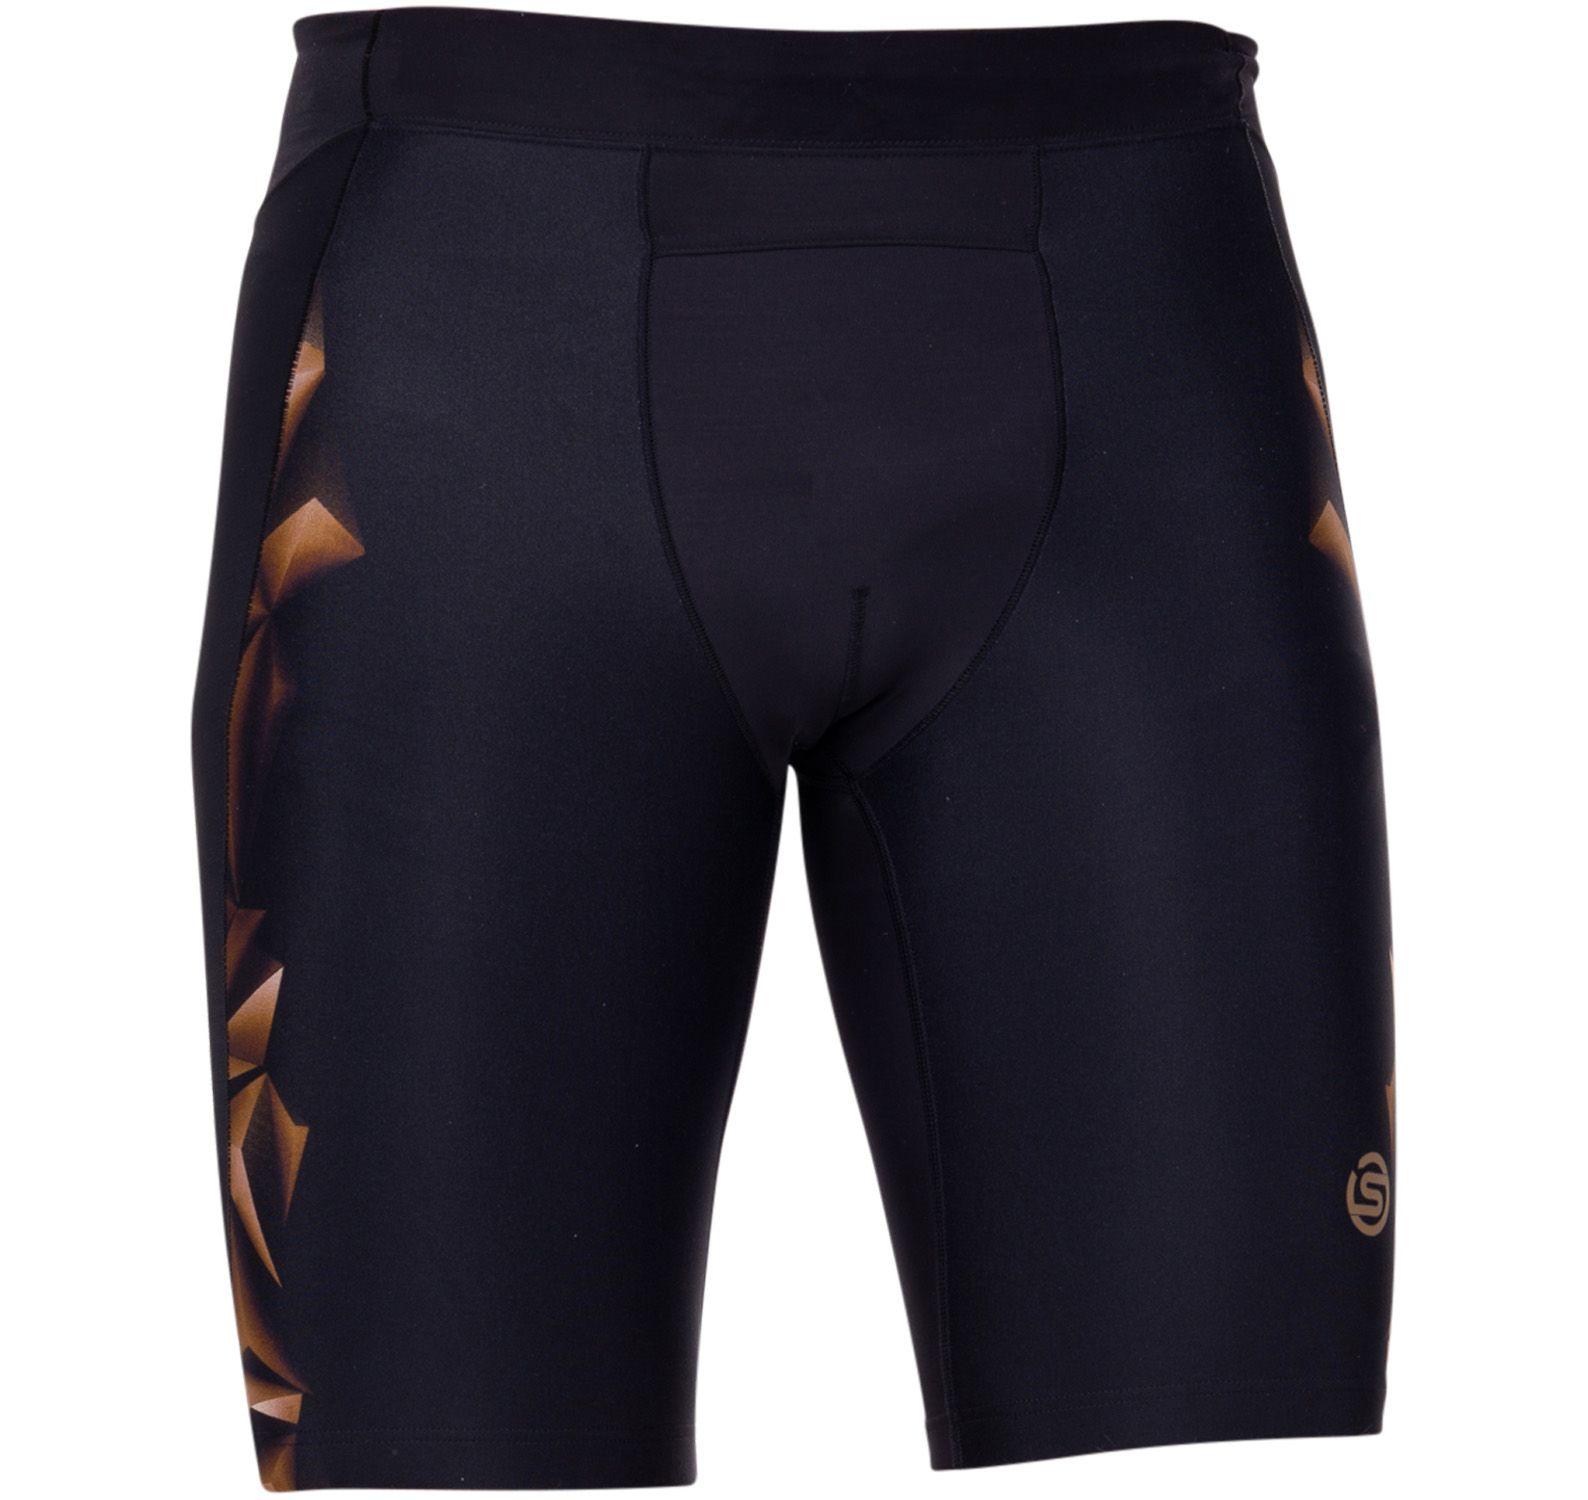 a400 mens 1/2 tights, black/gold, xs,  skins